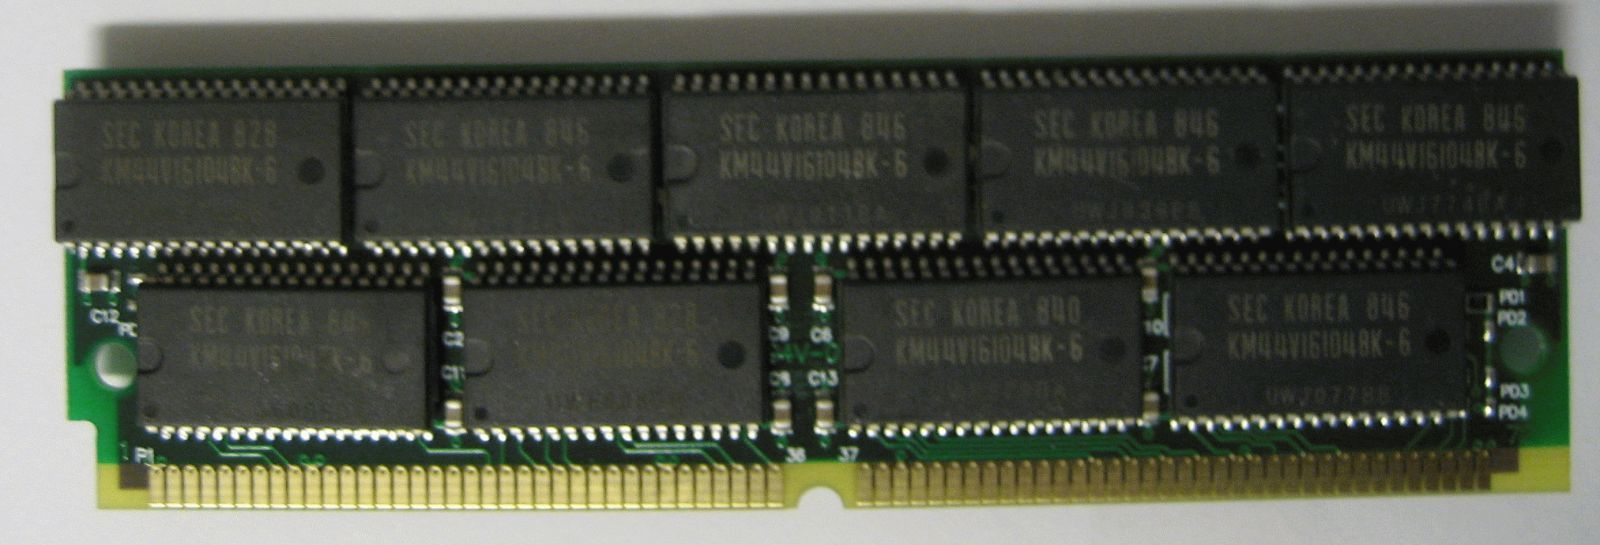 64MB 72pin SIMM MEMORY 16X36 WITH PARITY FP FPM 60NS 5V RAM